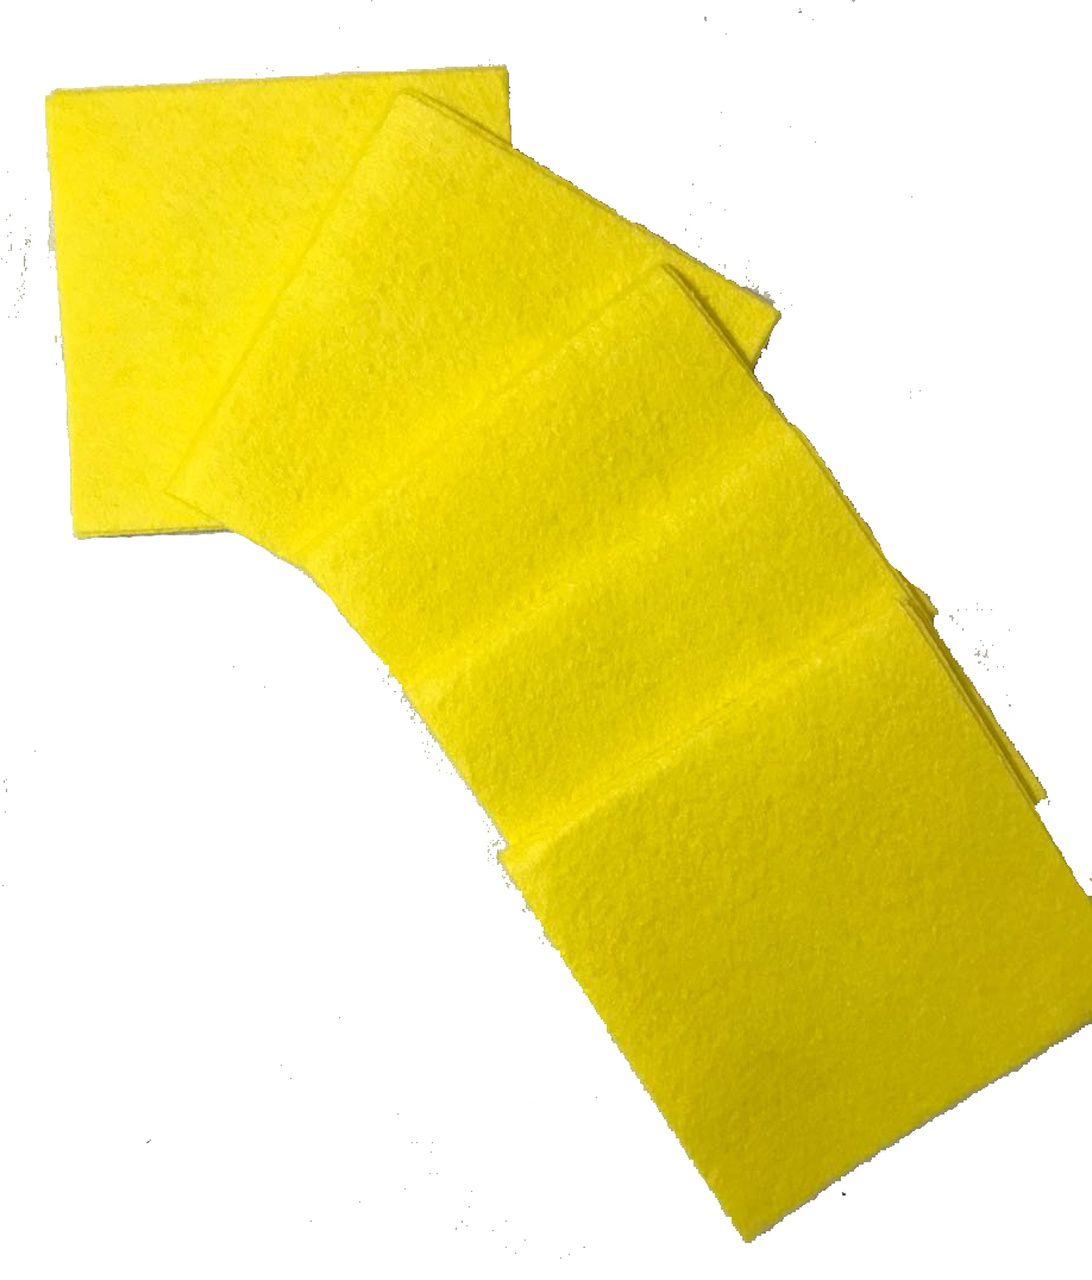 Pano Amarelinho Para Limpeza